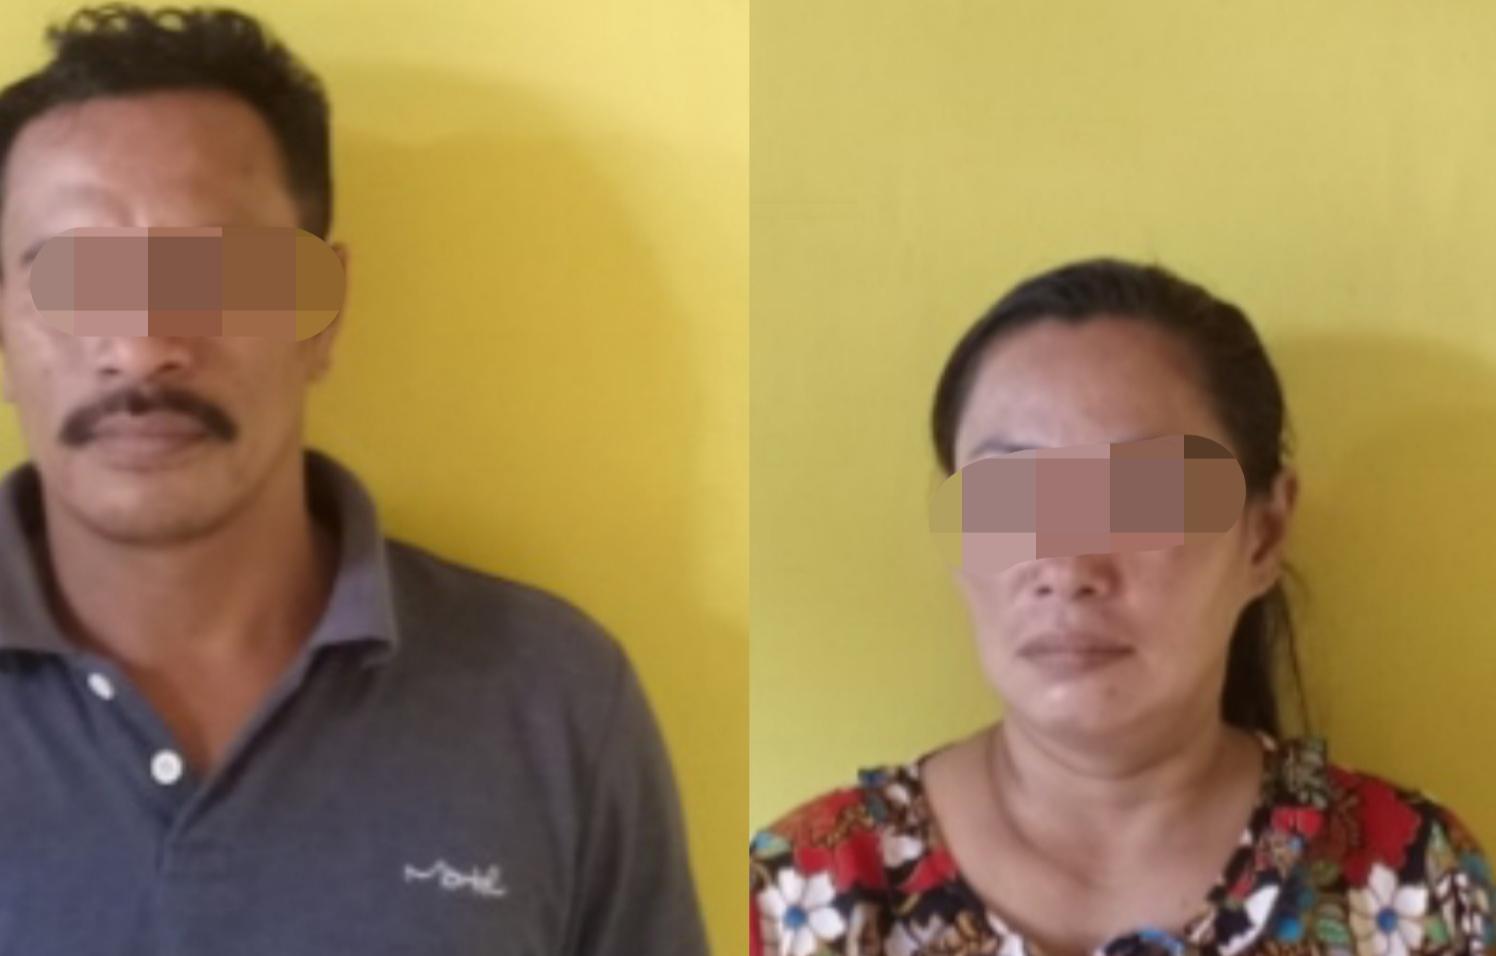 Tidak Mau Kapok , Mantan Napi Narkotika Bersama Istrinya Kembali di Ciduk Polisi   .